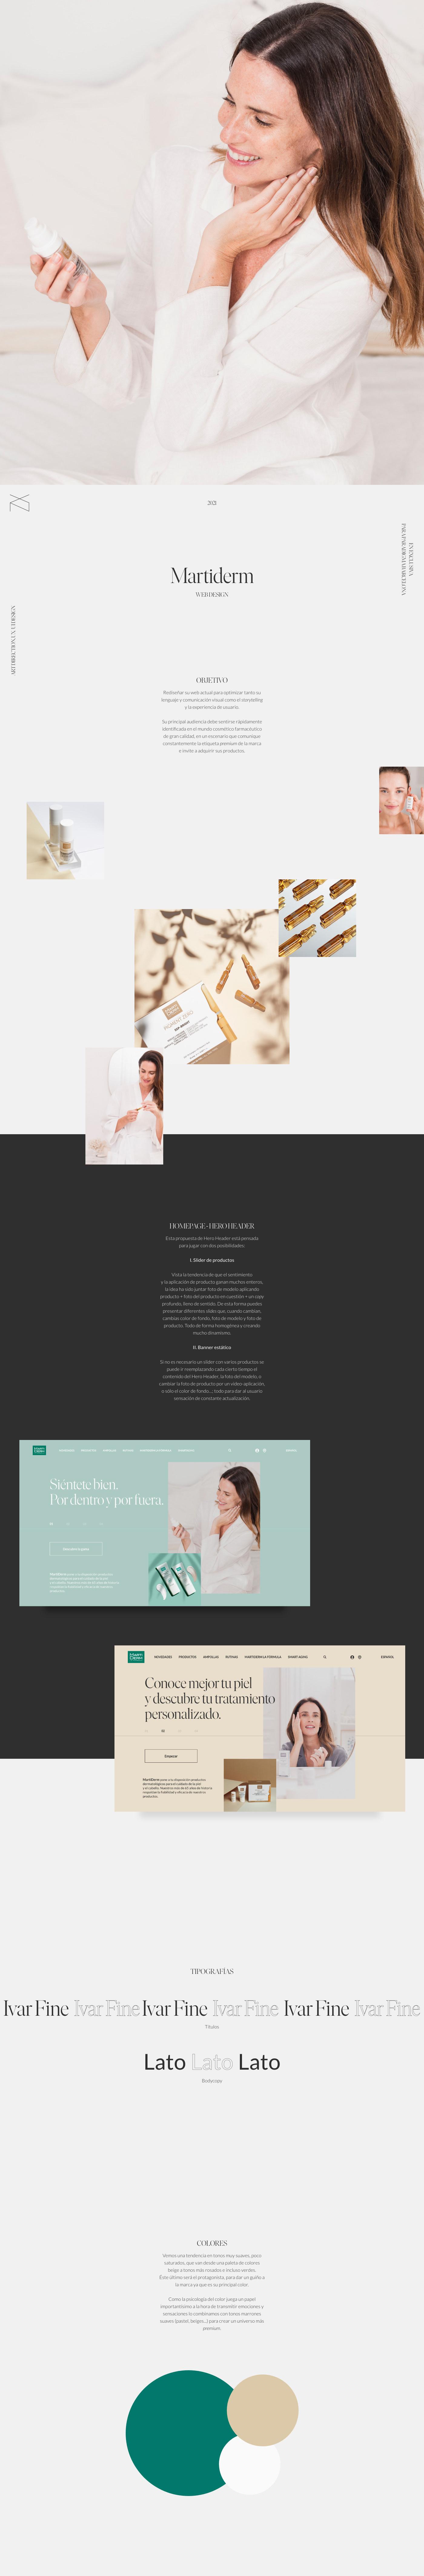 beauty cosmetica cosmetics Ecommerce skin care UI ux Web Website